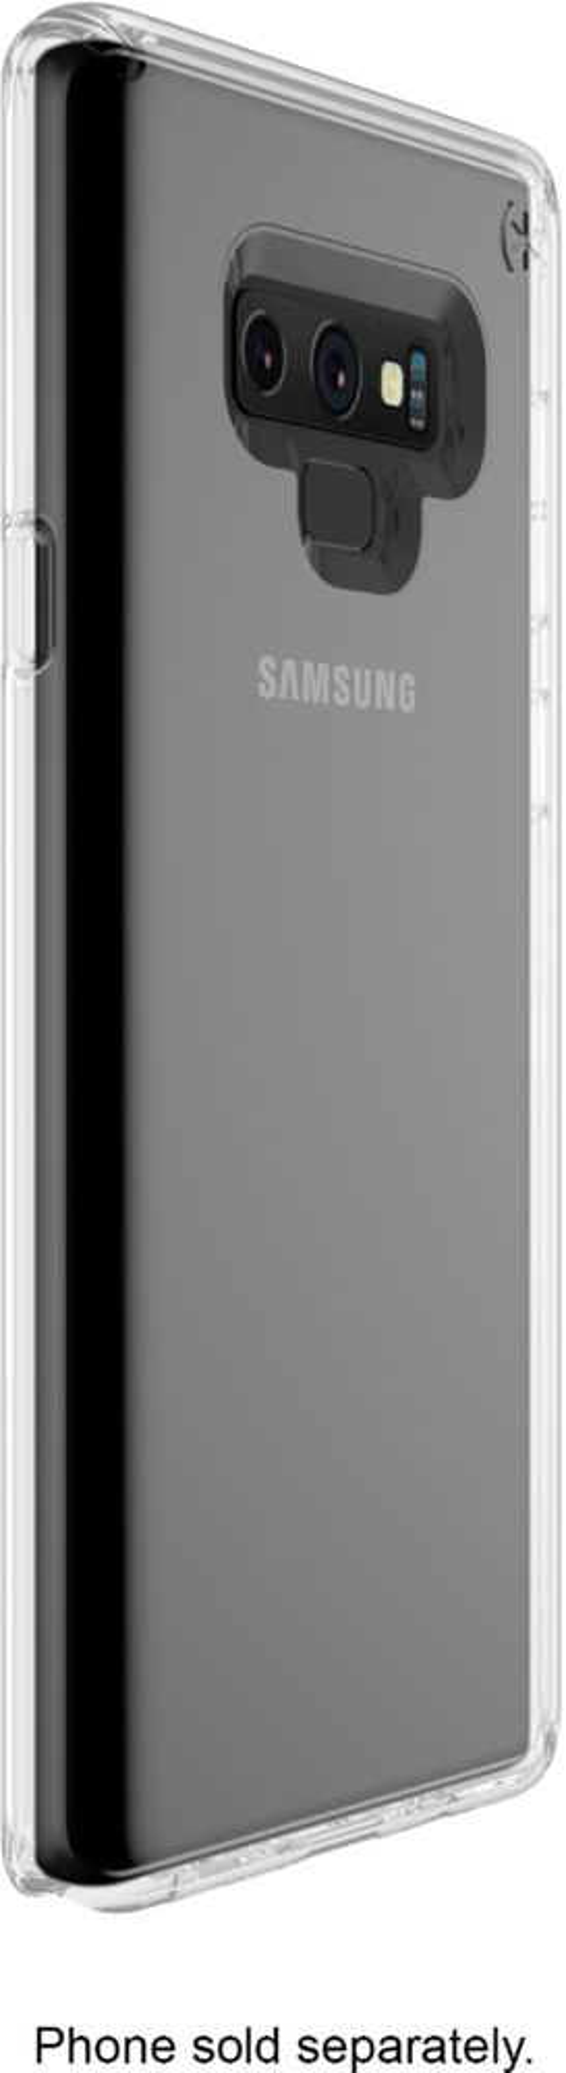 Speck 119402-5085 angleImage